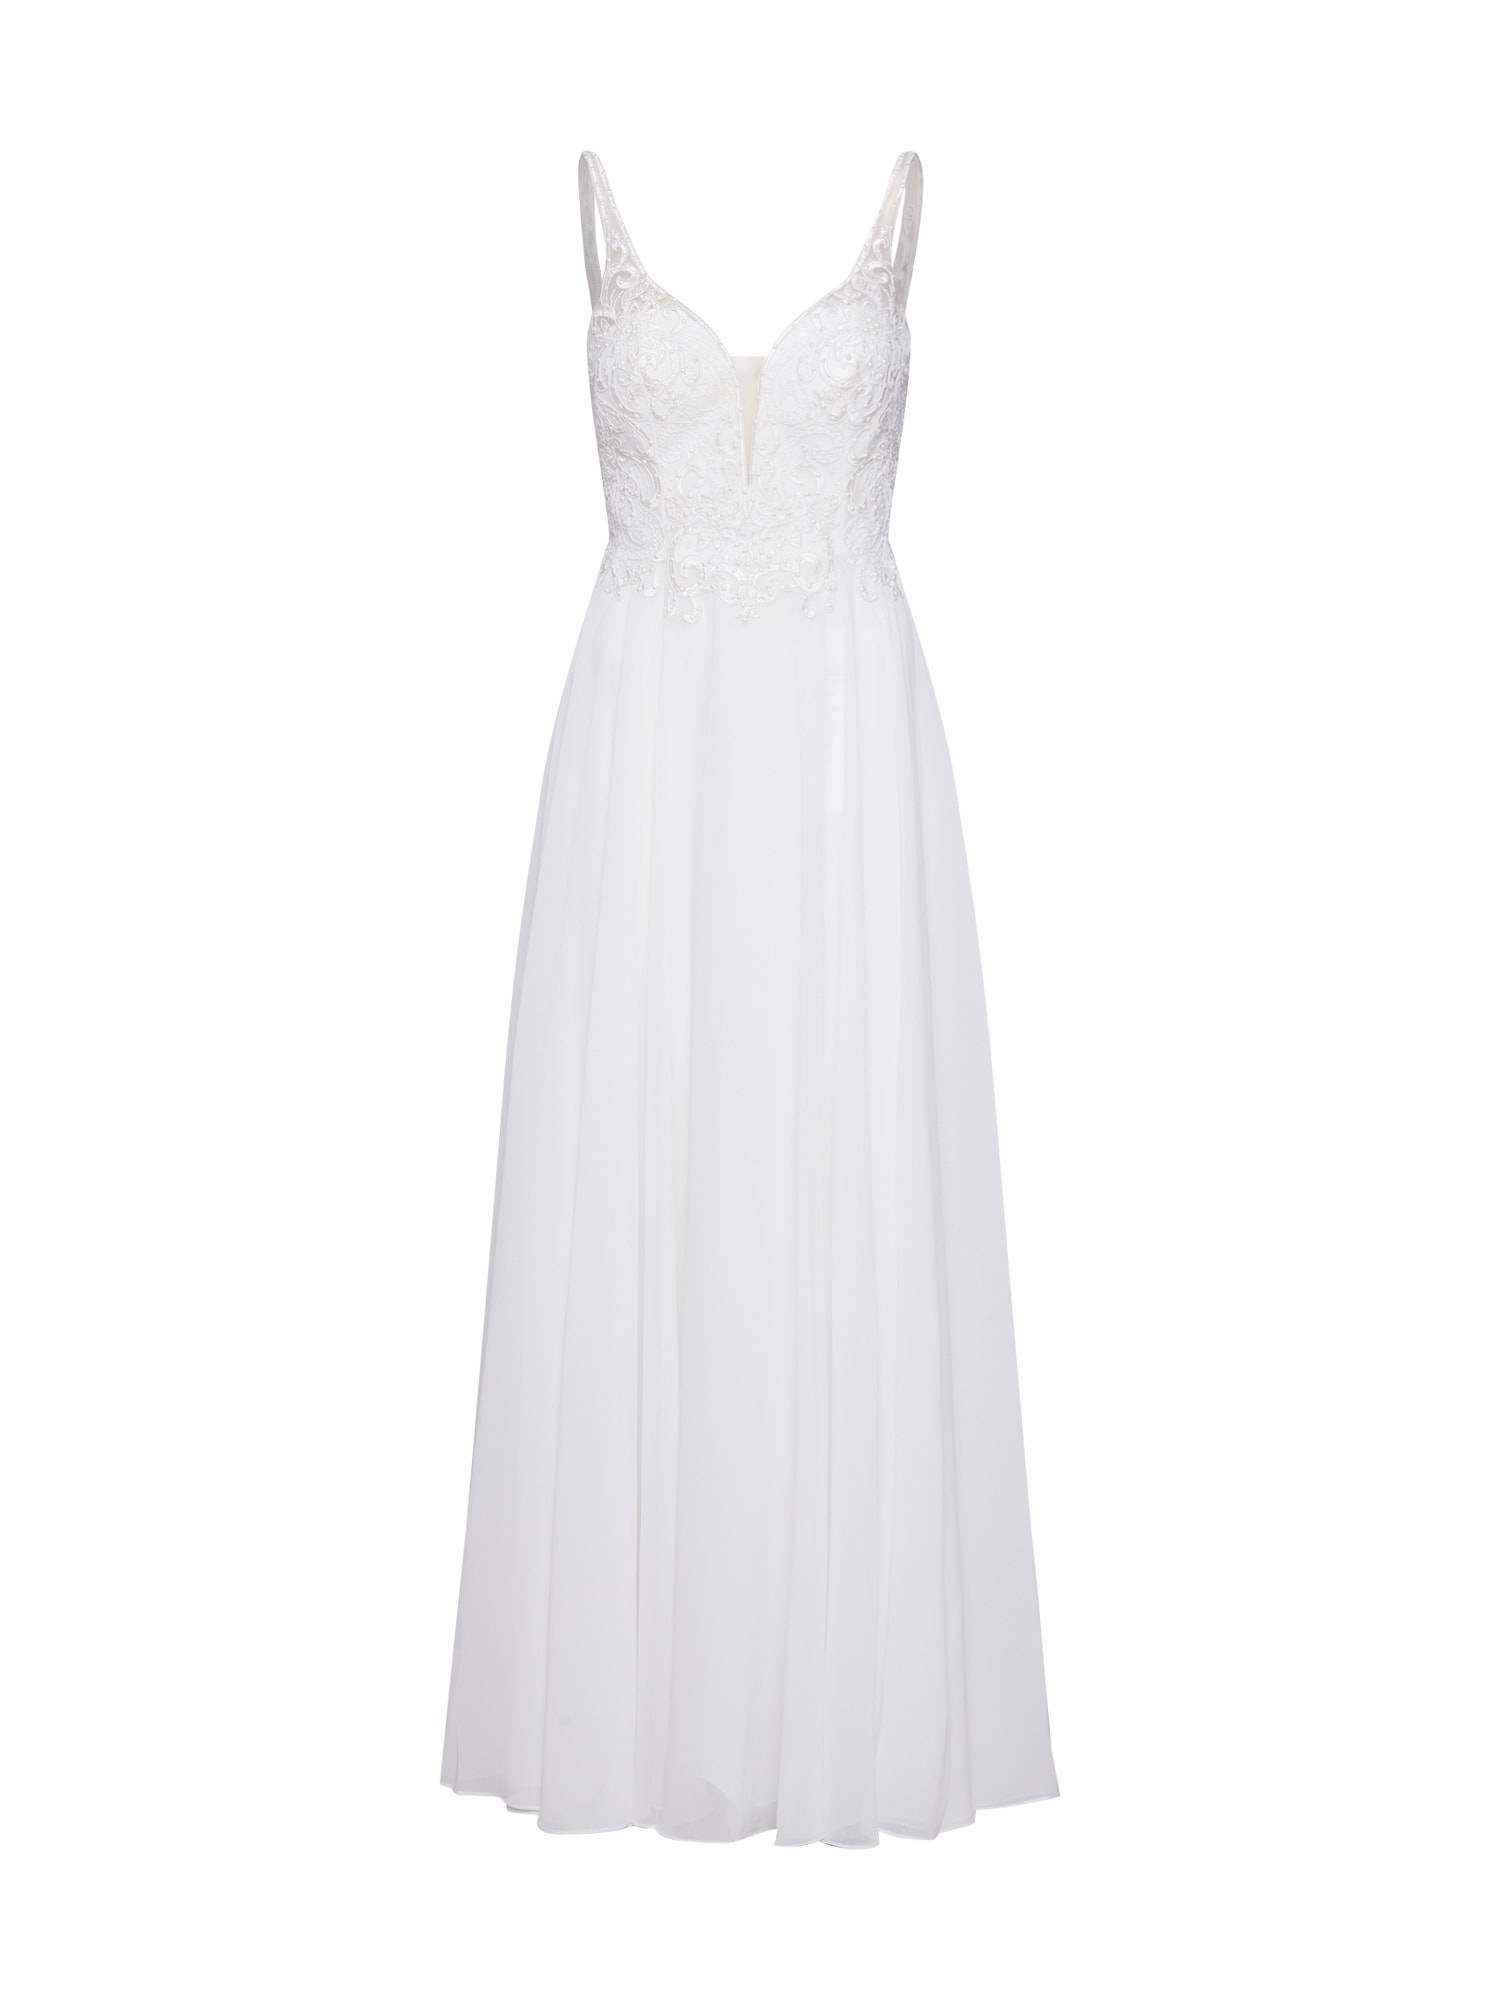 mascara Robe de soirée 'MC181487'  - Blanc - Taille: 38 - female